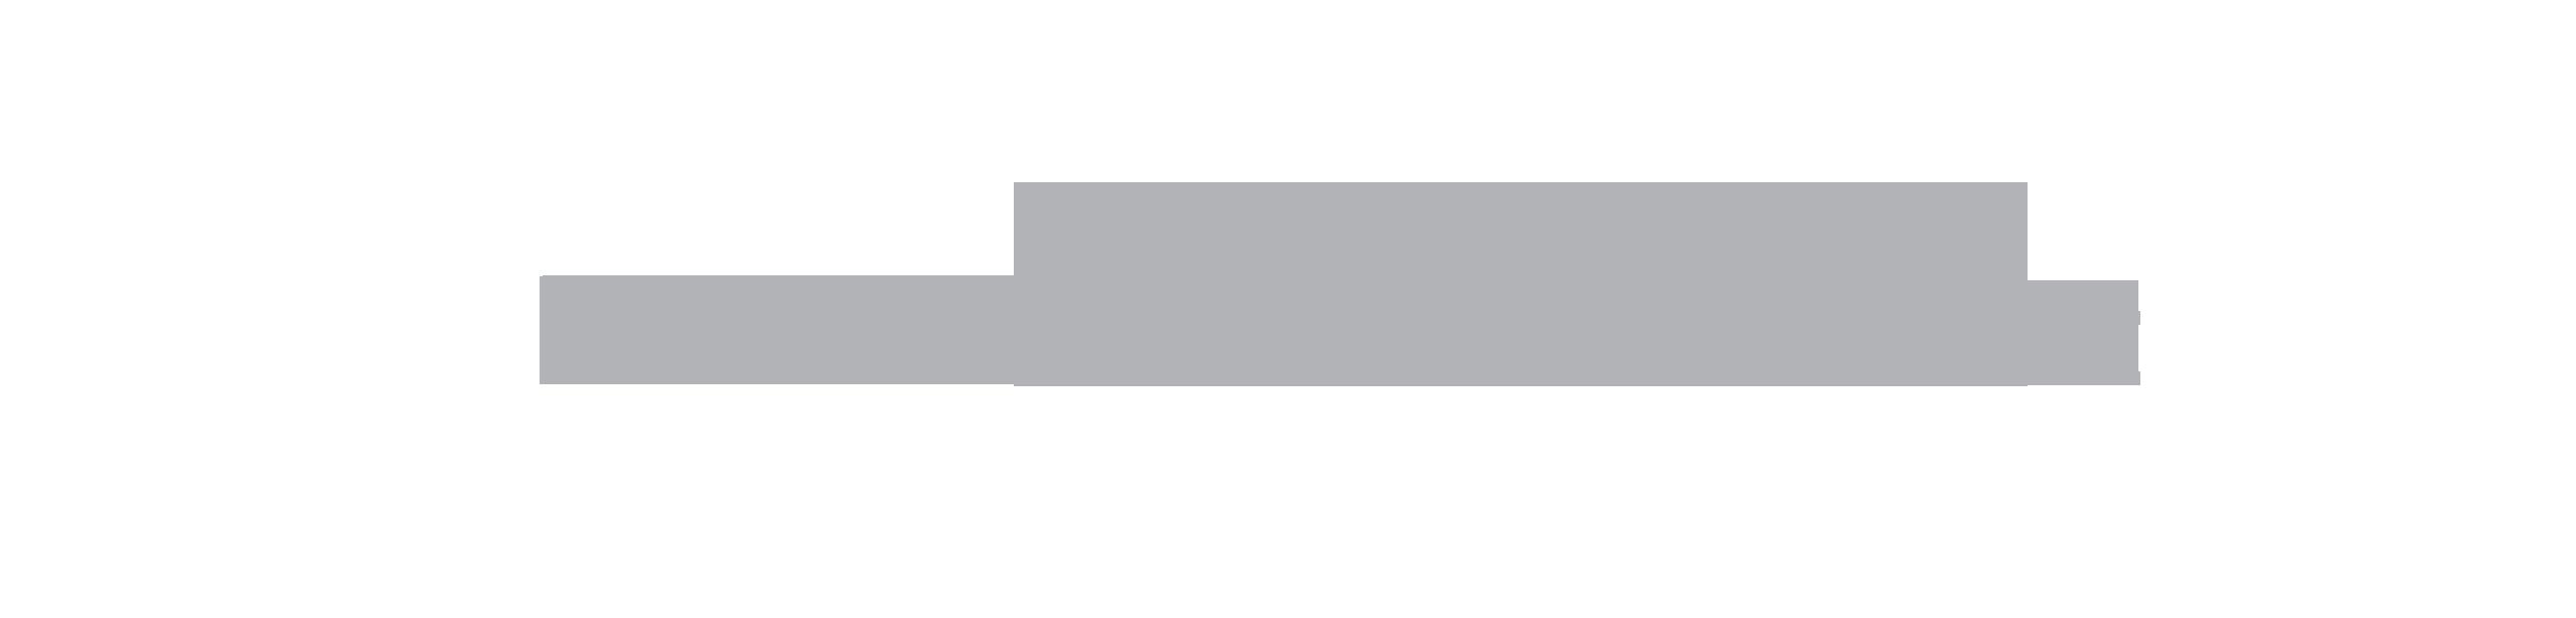 cooperation phs X TUD